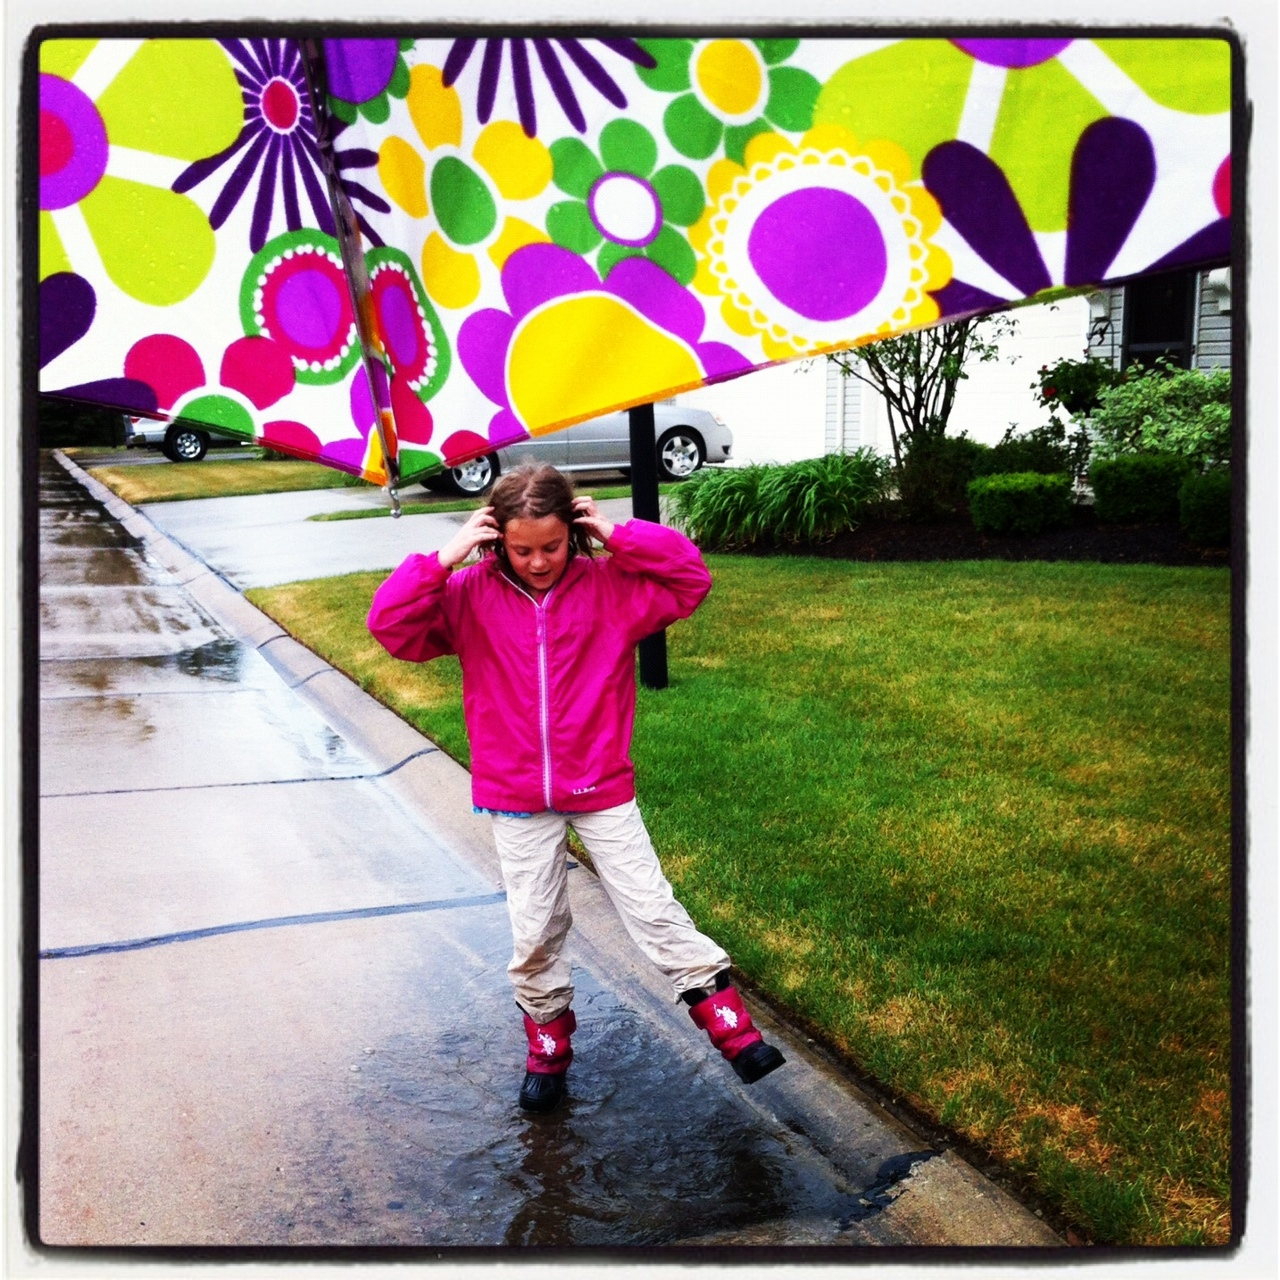 2012-06-29-RainyDayOrBestPuddleEver.JPG